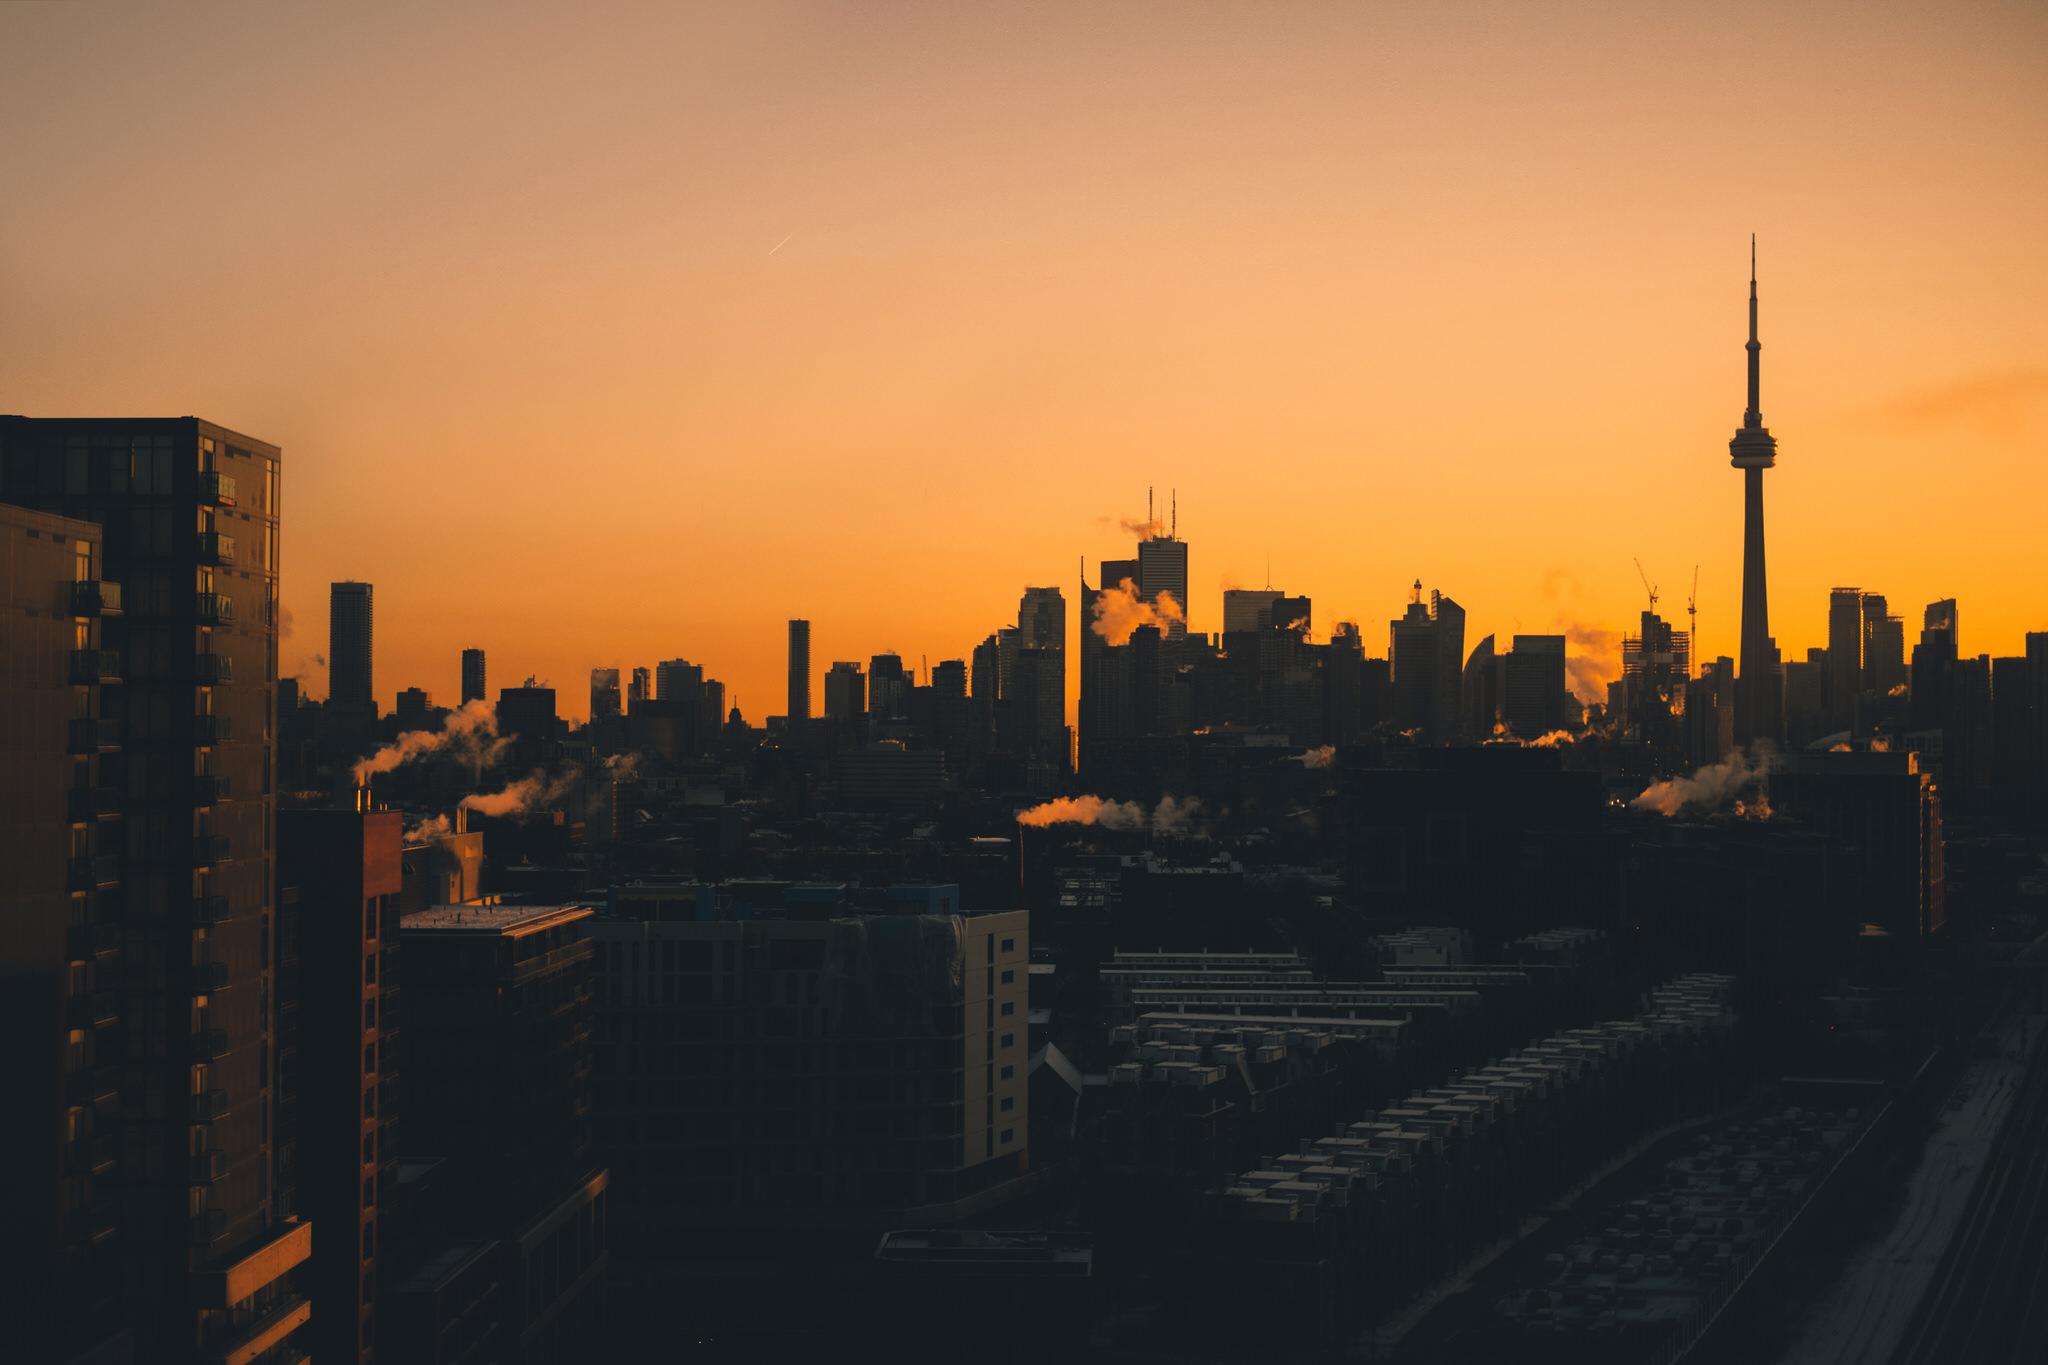 Toronto Skyline in Silhouette at Sunrise